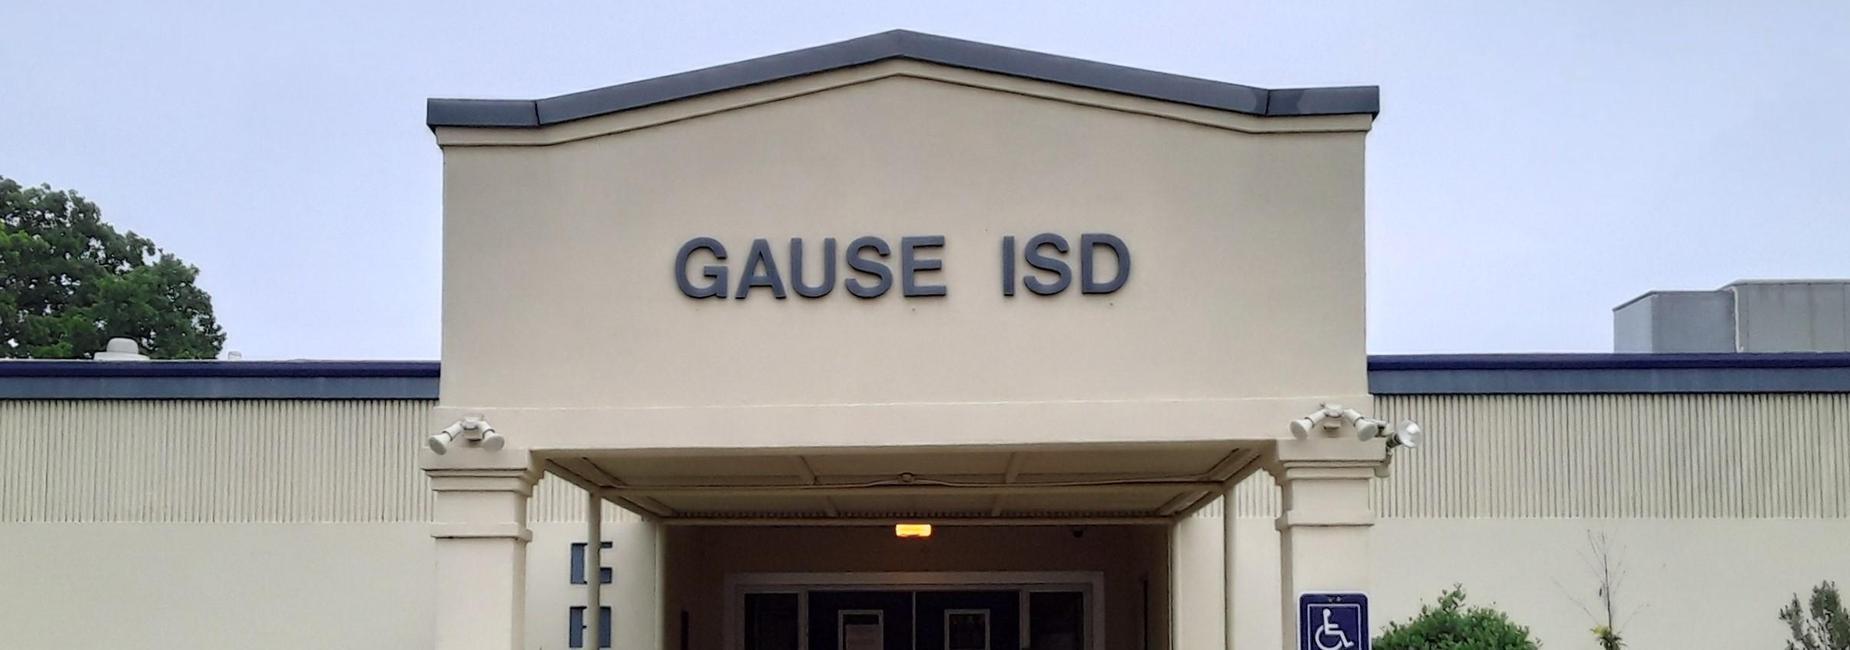 Gause ISD